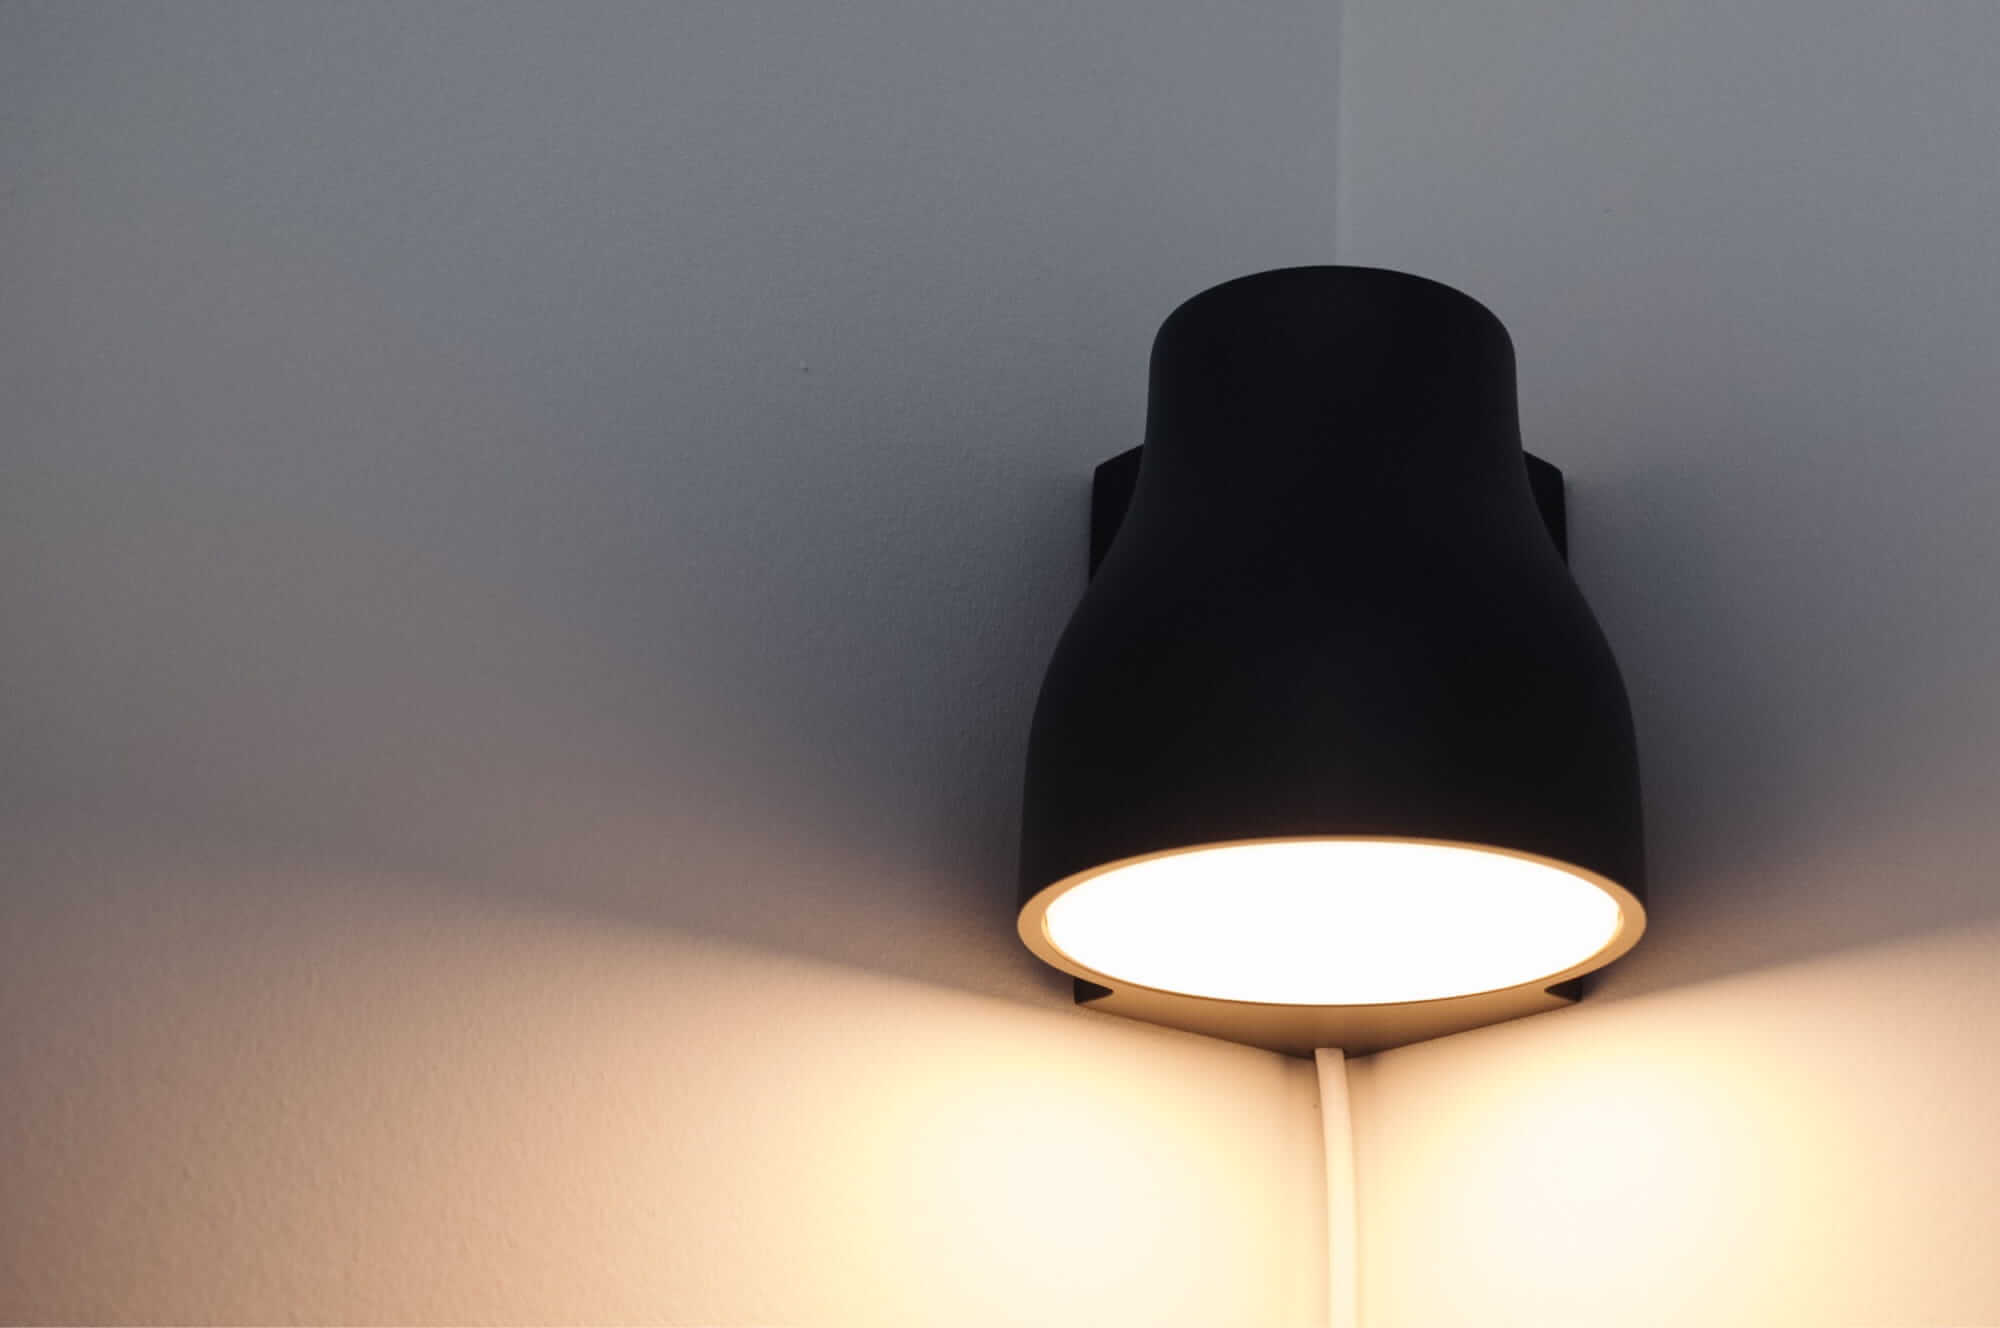 Gantri Carve Light Review